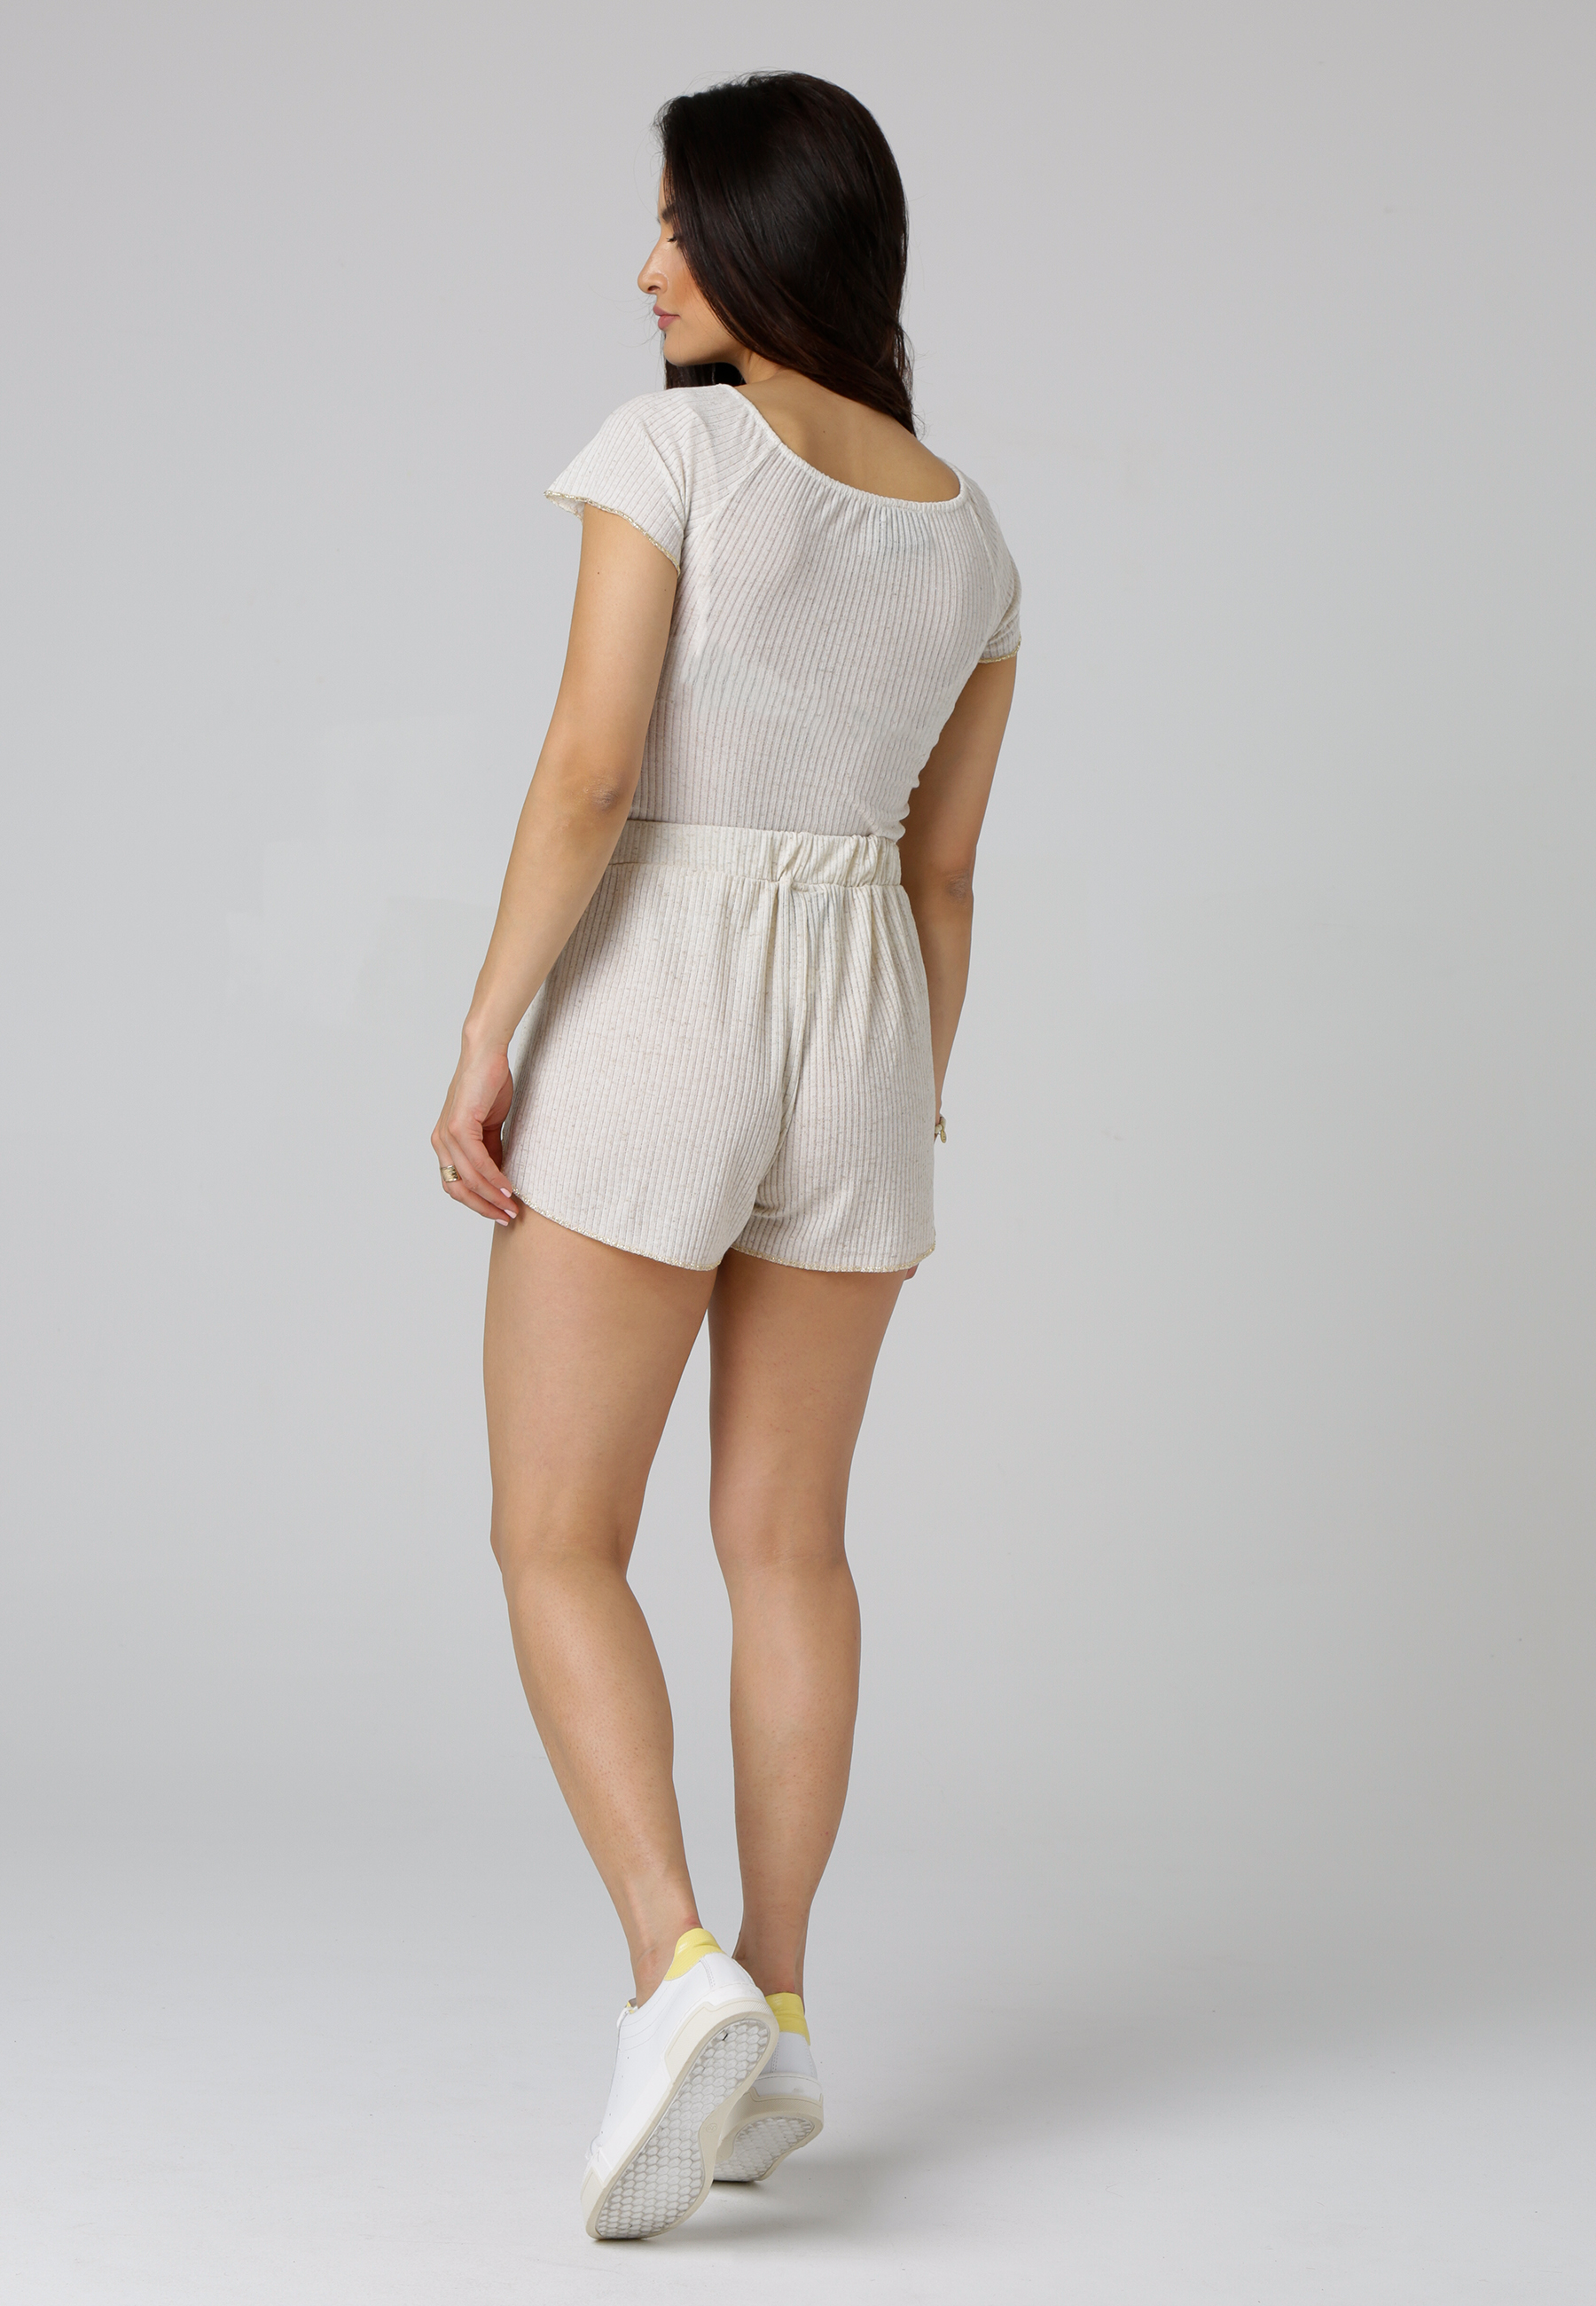 MiaZAYA Shorts Saumen gold